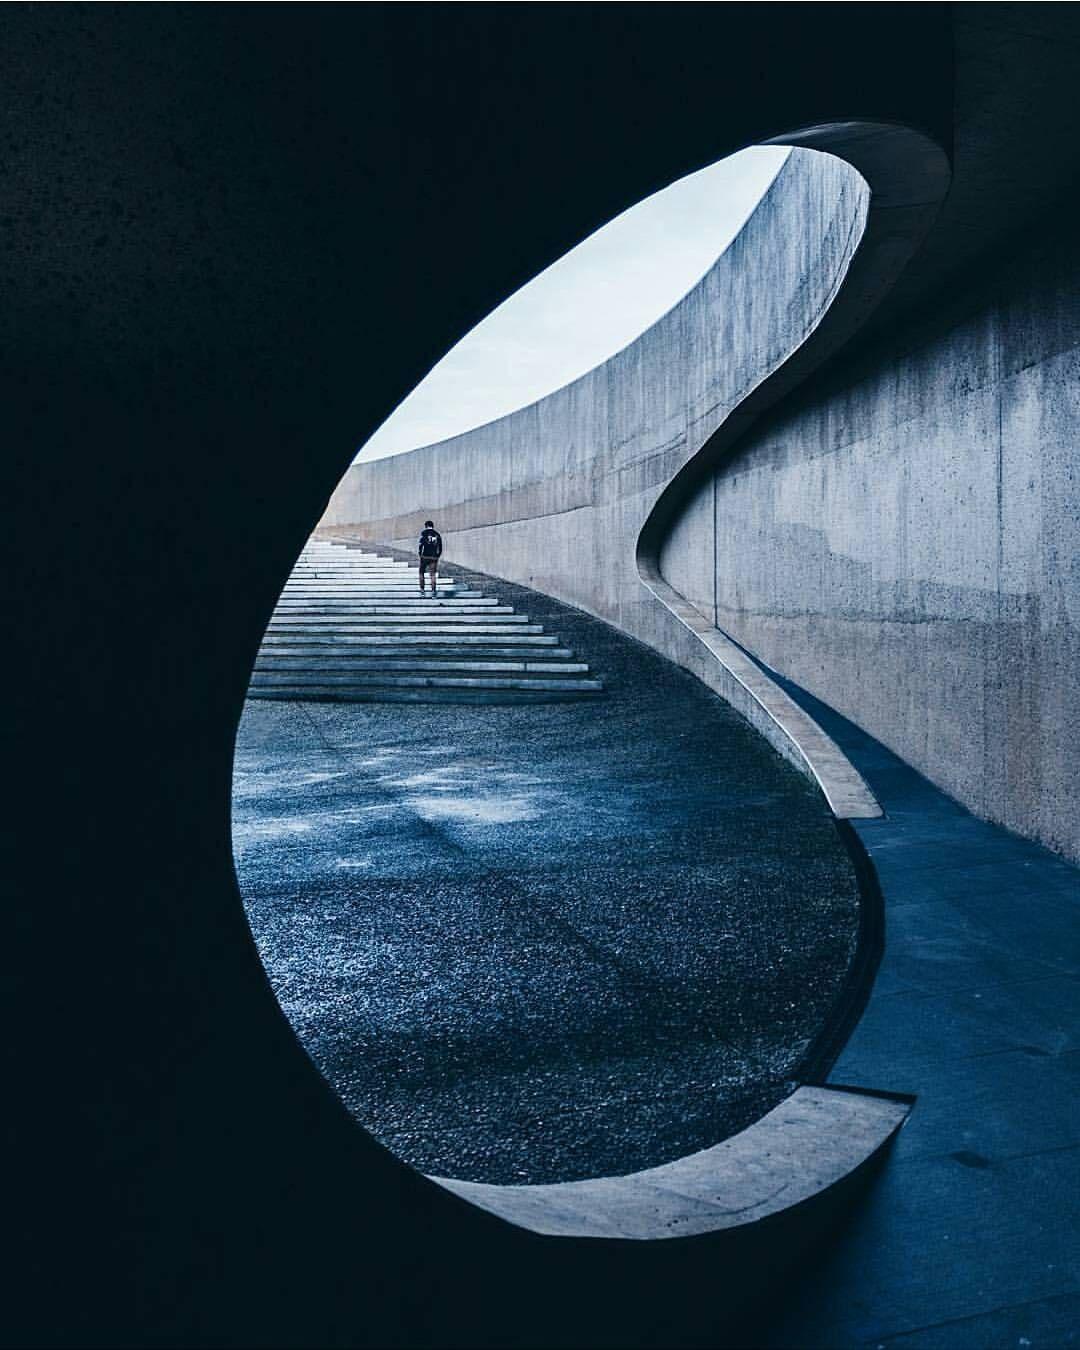 Repost By Honestframes Featuring Koenstijnen Architecture Design Architecture Photography Amazing Architecture